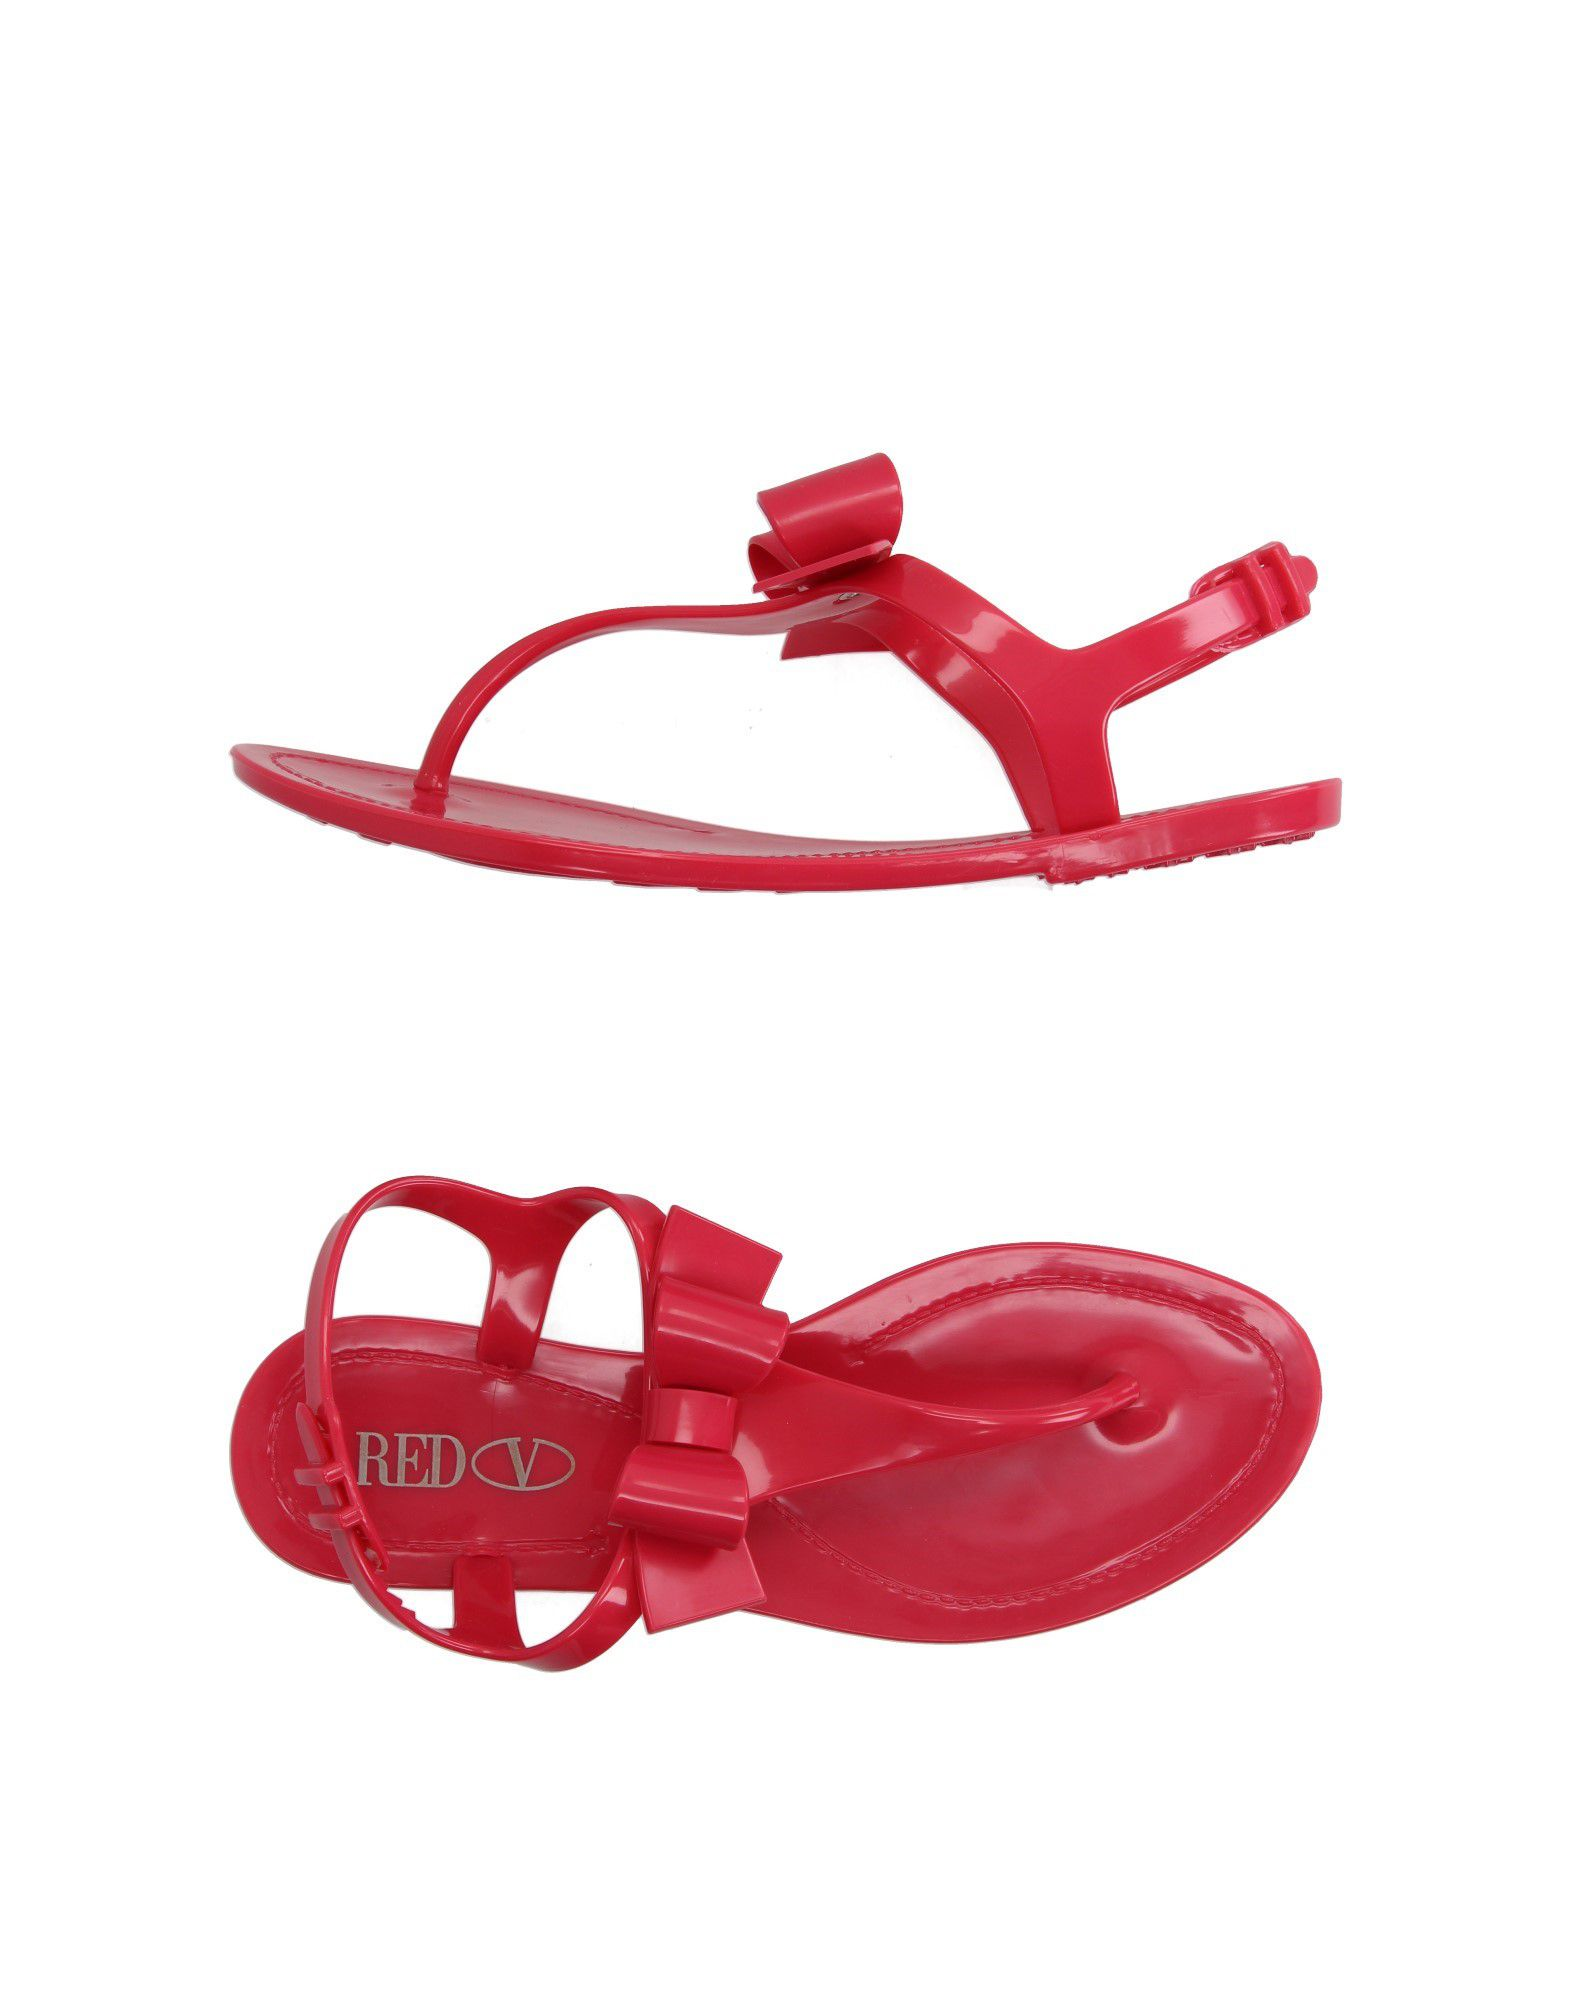 Red(V) Dianetten Damen  44994617QG Gute Qualität beliebte Schuhe